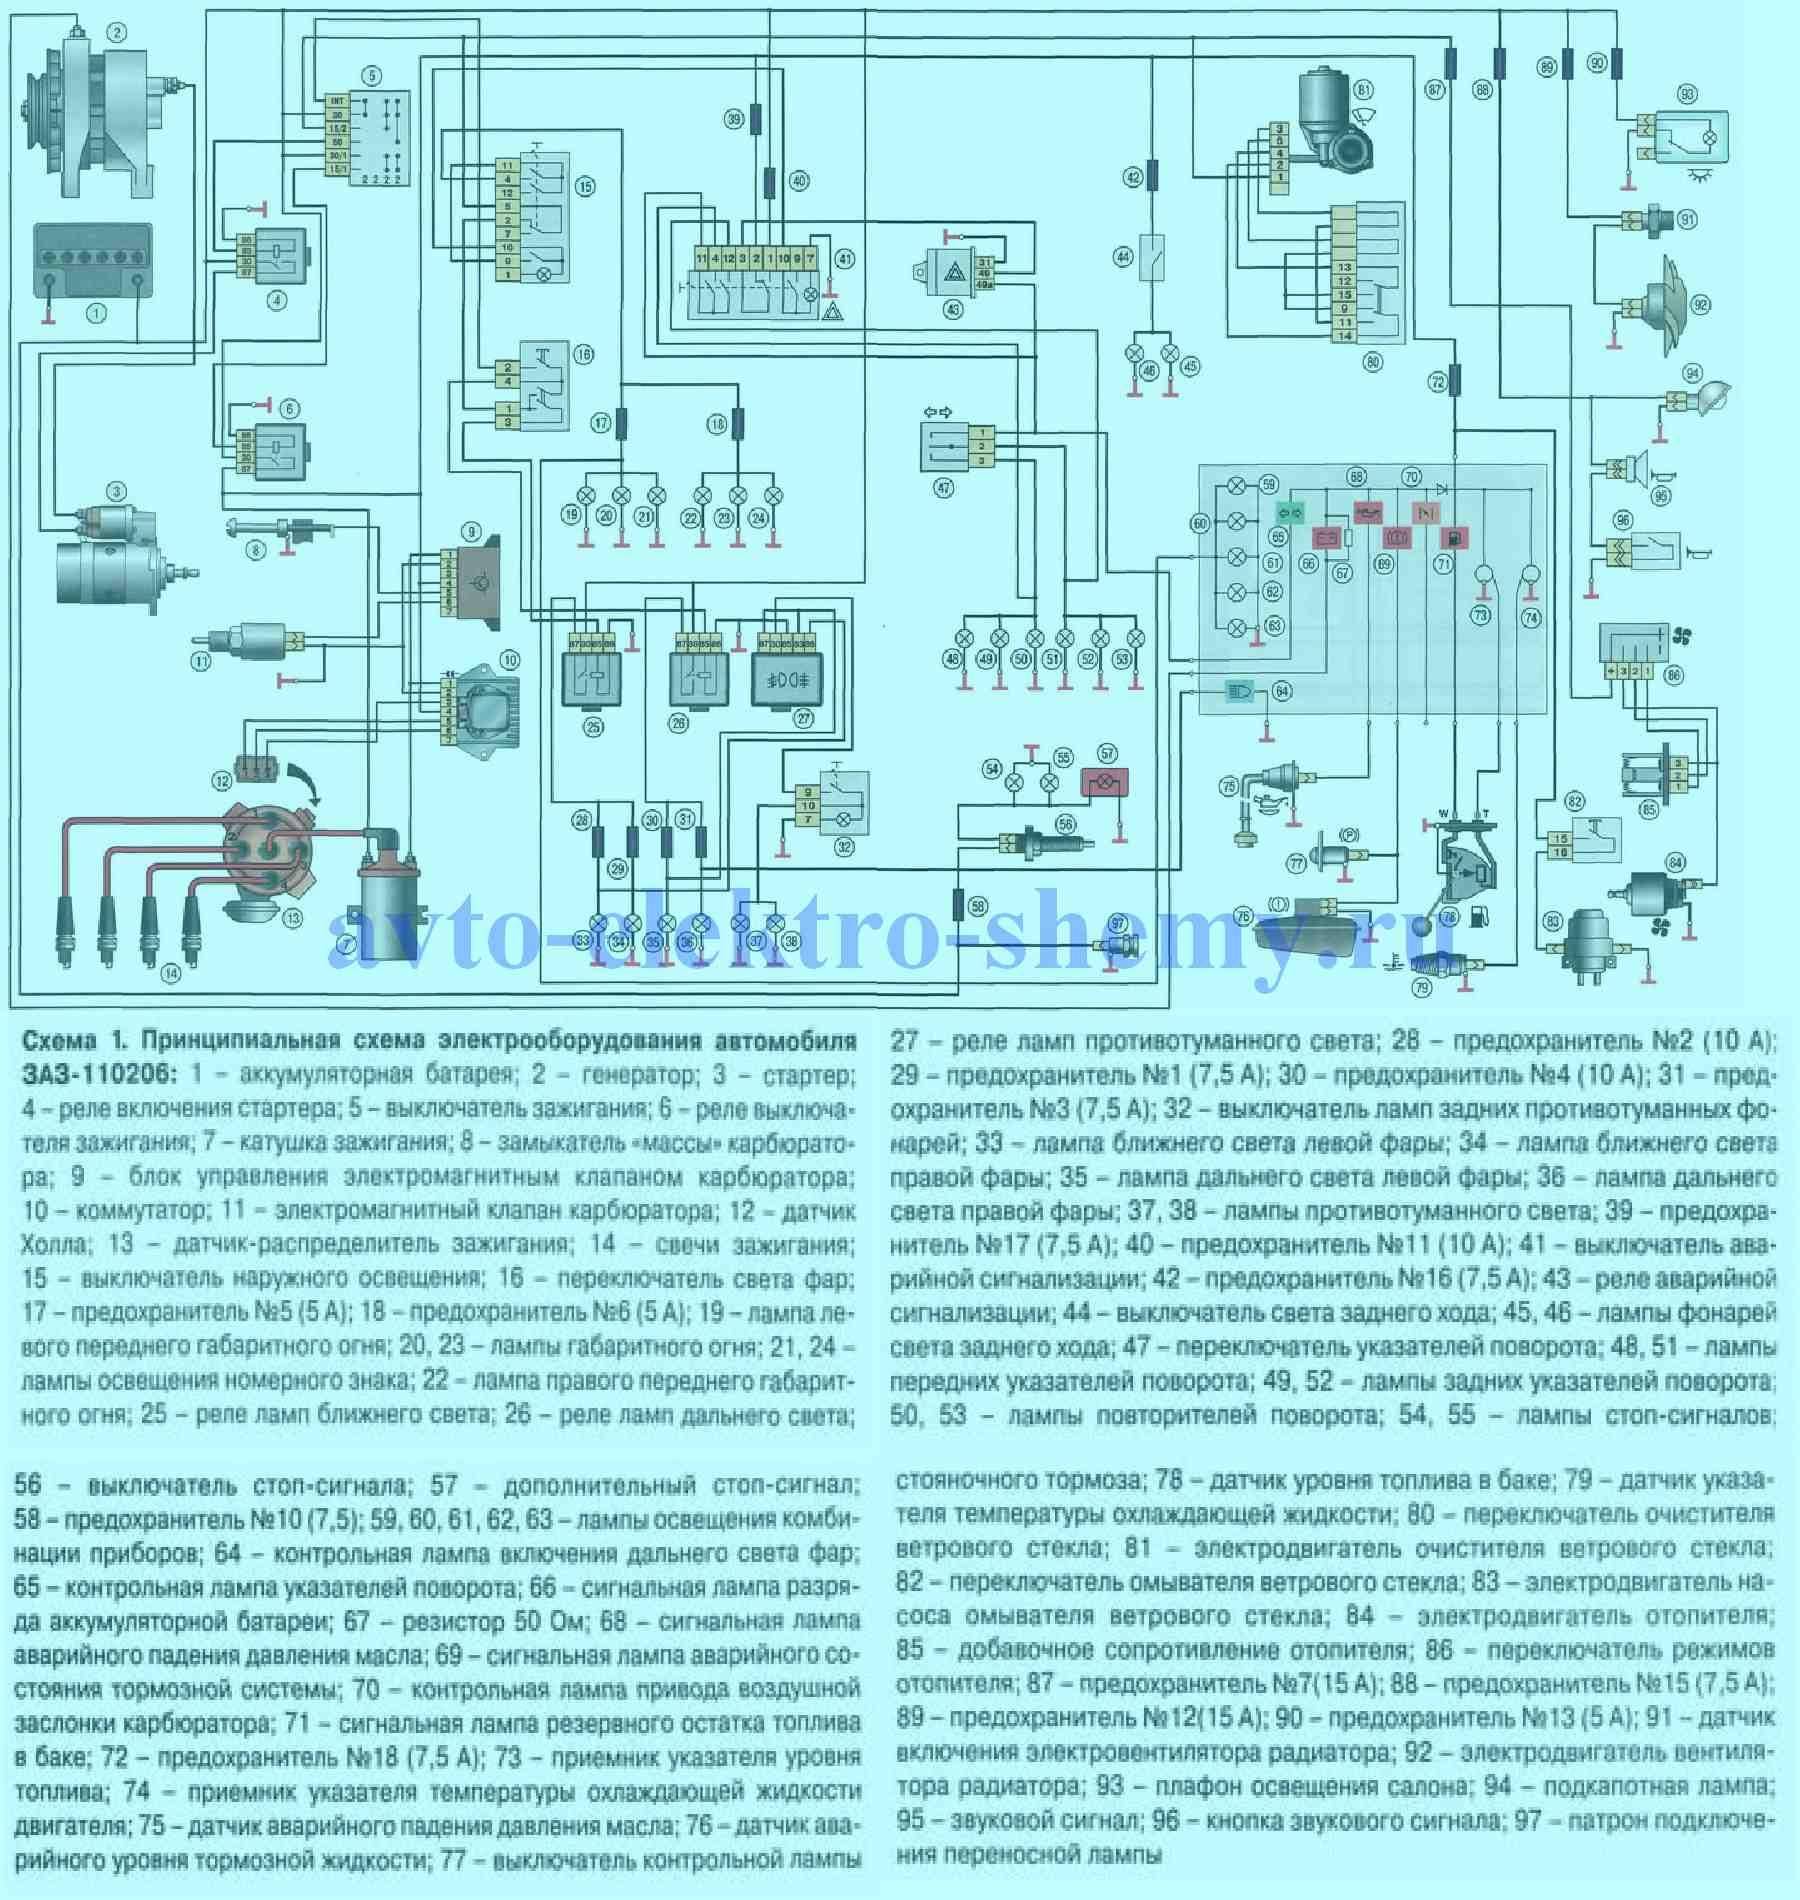 www.автоэлектро схема газель инжектор диогностика